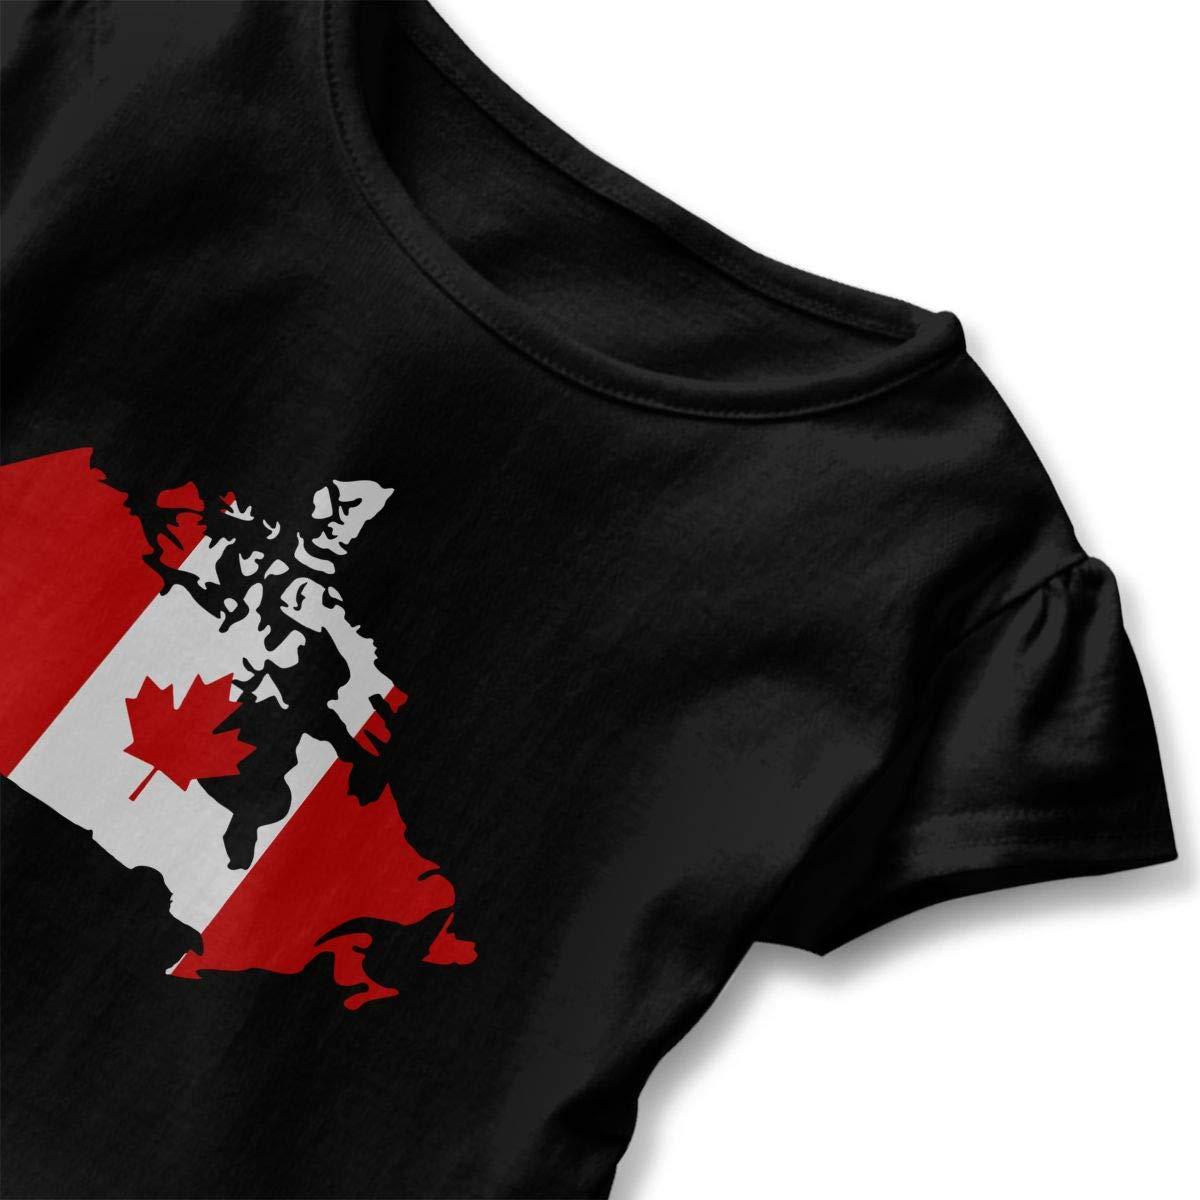 SHIRT1-KIDS Canadian Map with Canada Flag T-Shirts Toddler//Infant Girls Short Sleeve Ruffles Shirt T-Shirt for 2-6T